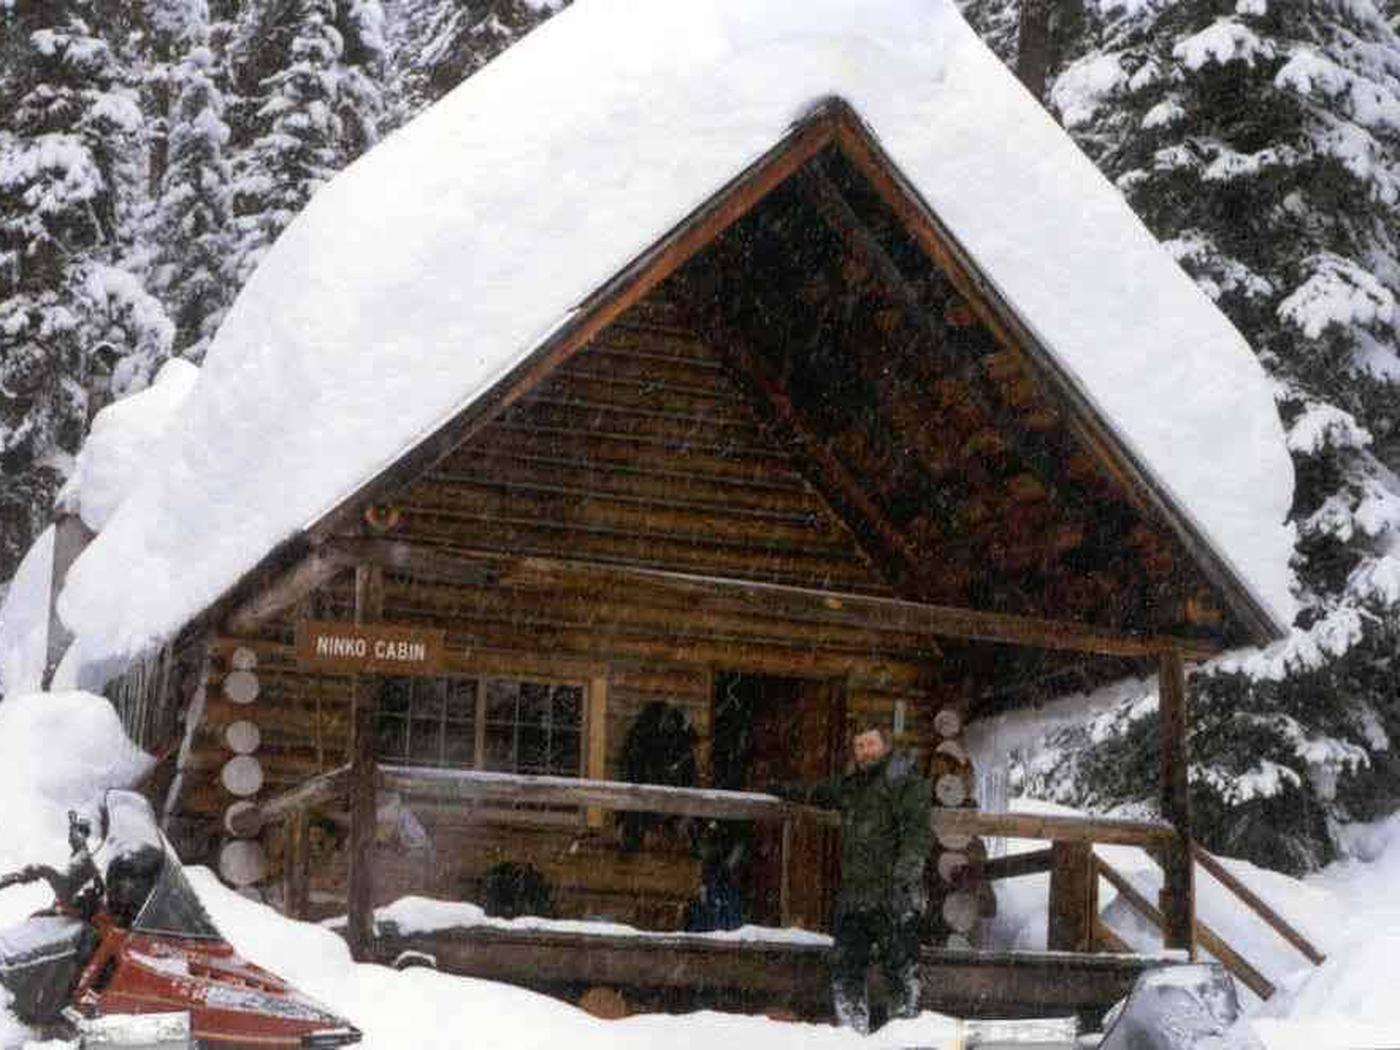 Winter at NinkoNinko Cabin